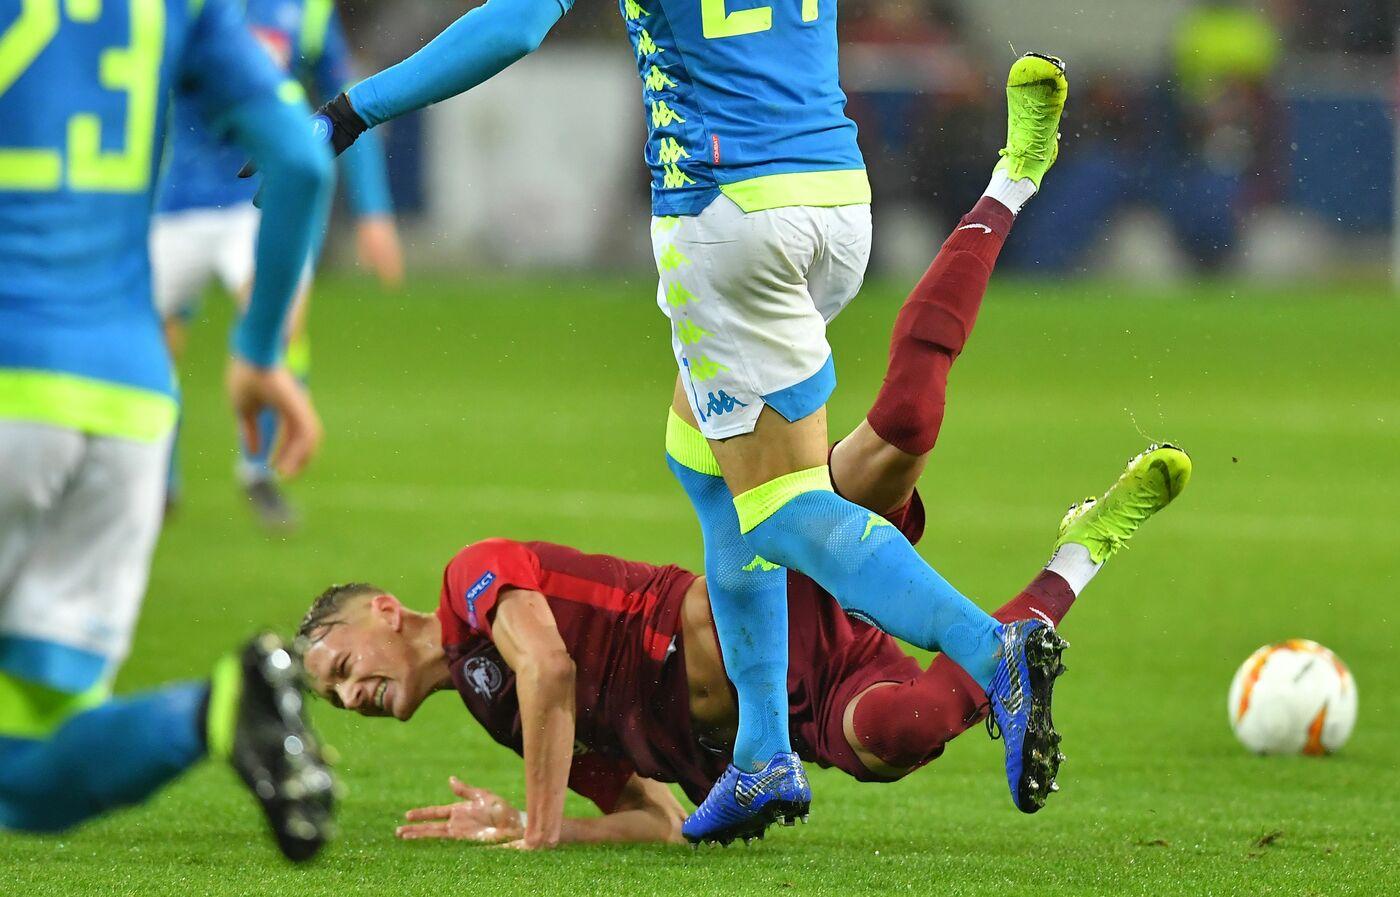 Salisburgo Napoli Hd: UEFA Europa League 2018/2019